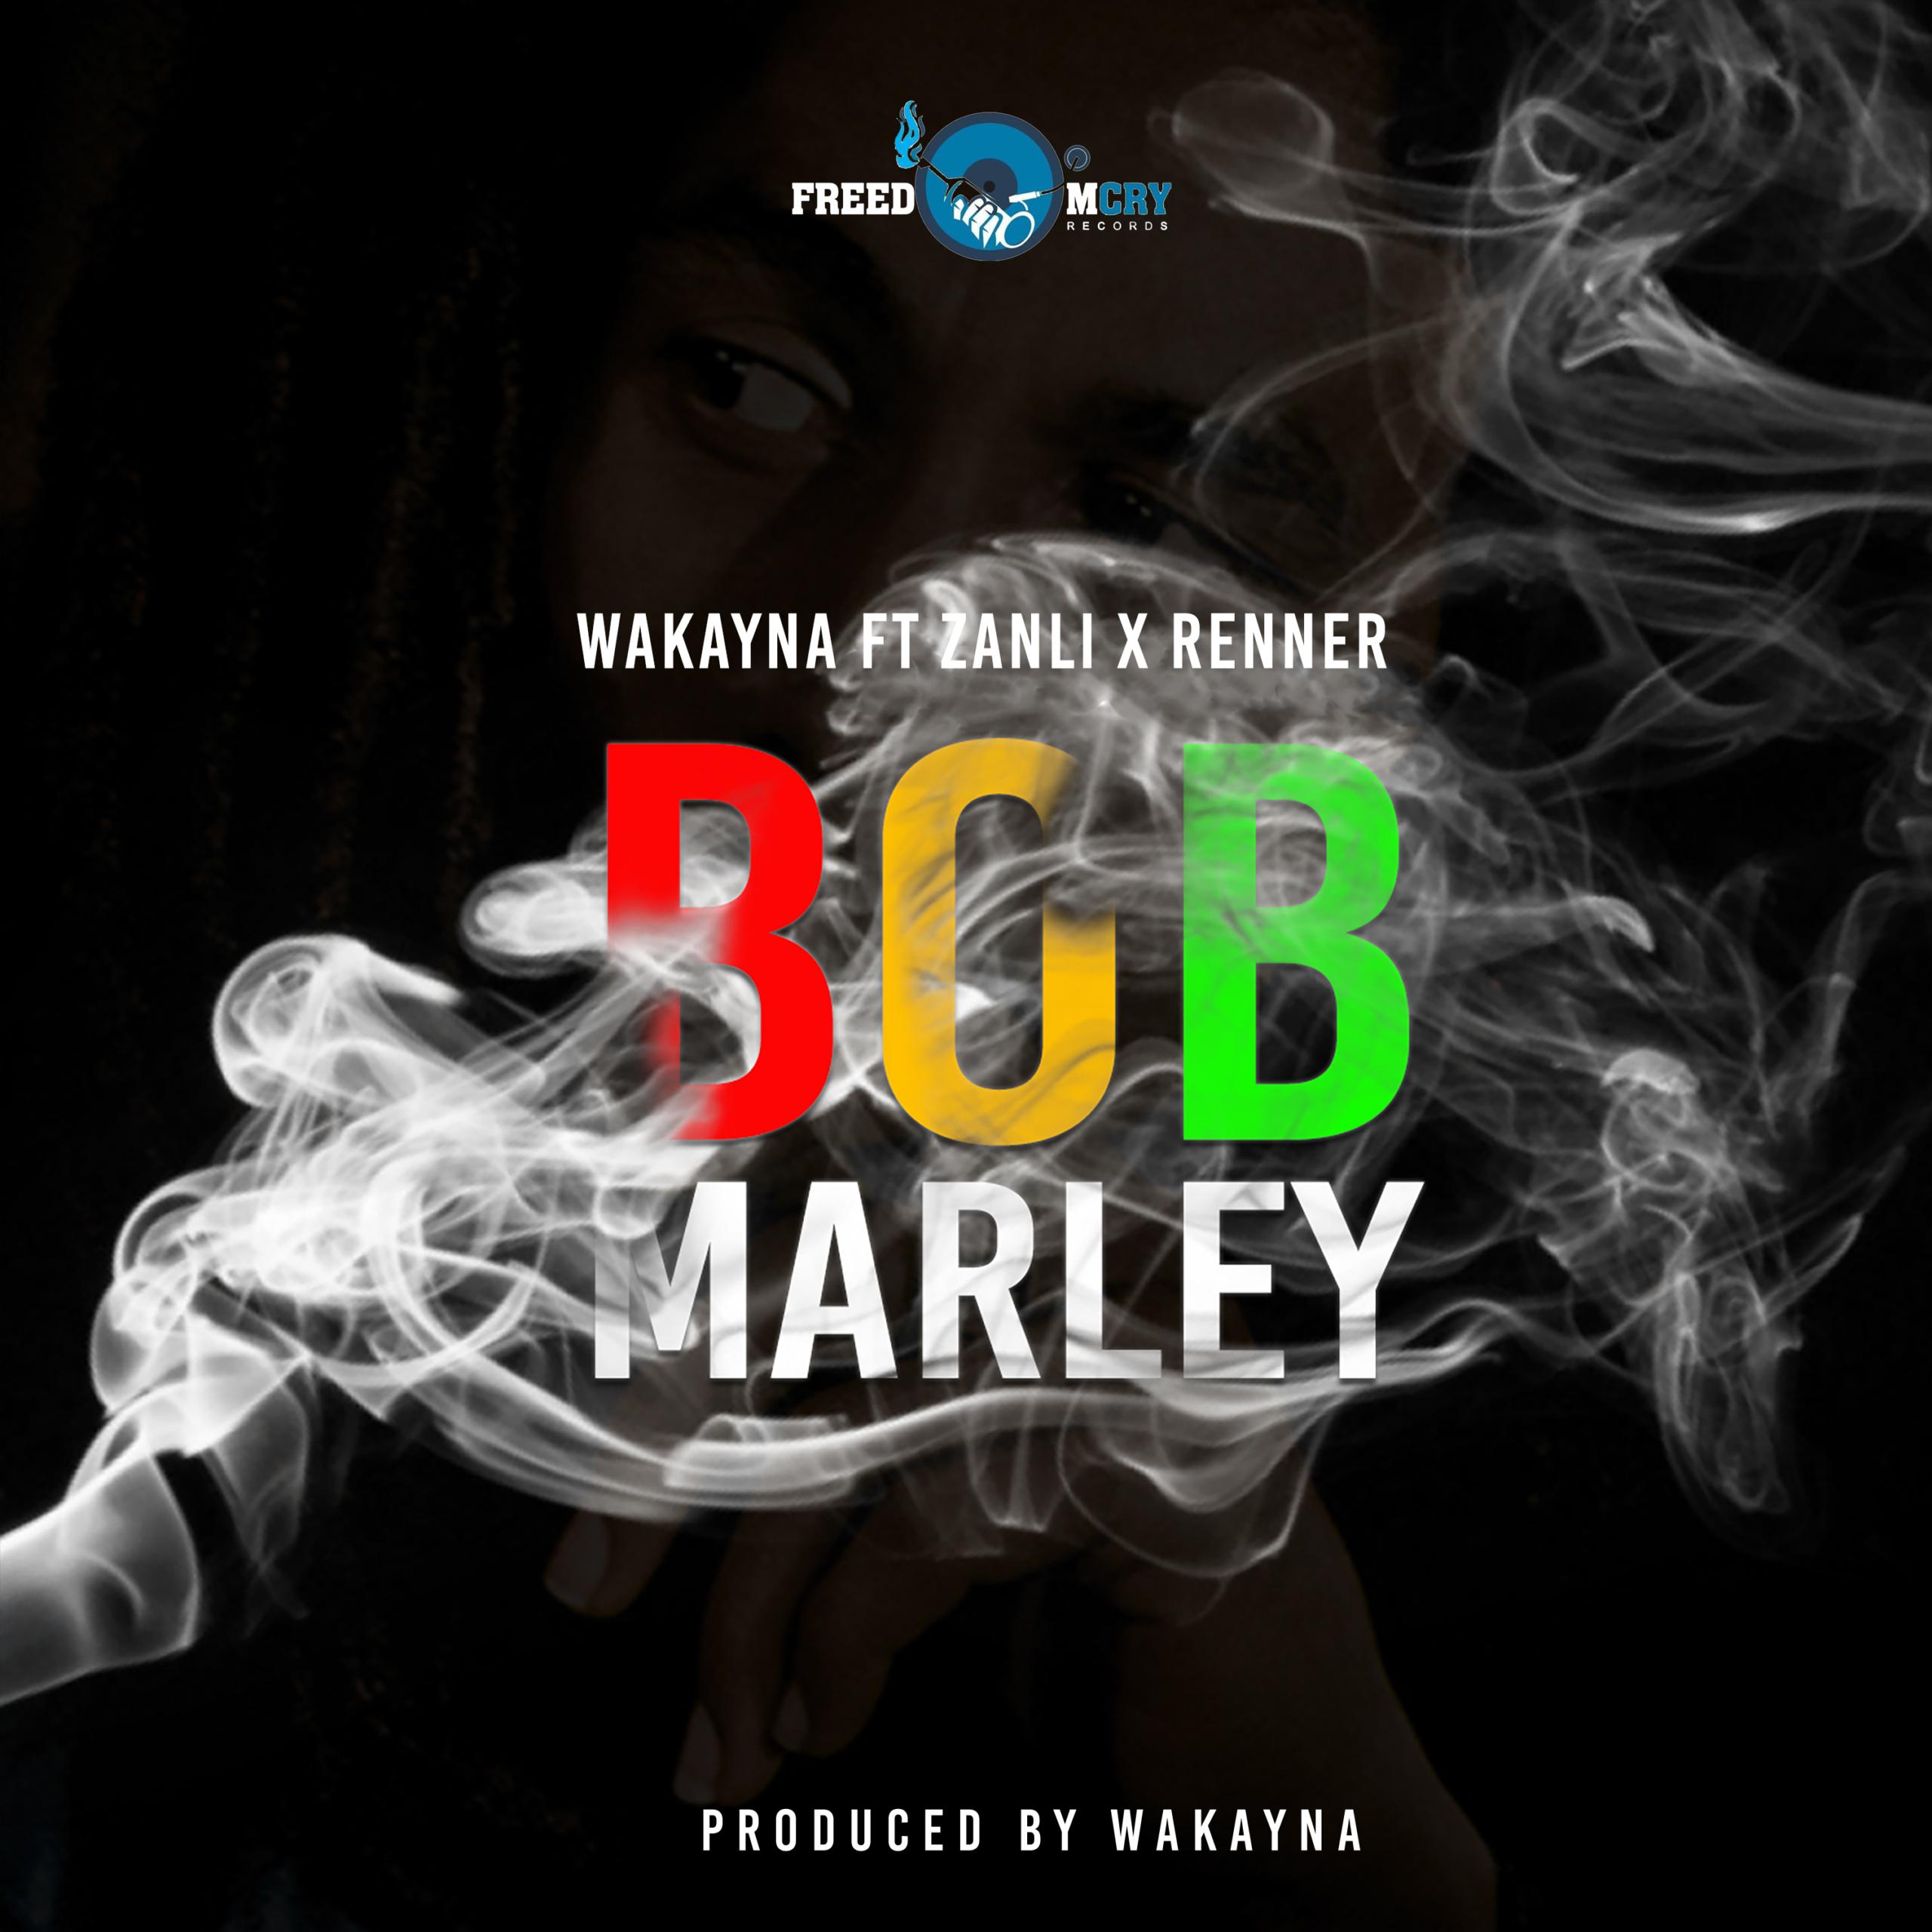 Wakayna ft. Zanli & Renner – Bob Marley (Prod. by Wakayna)